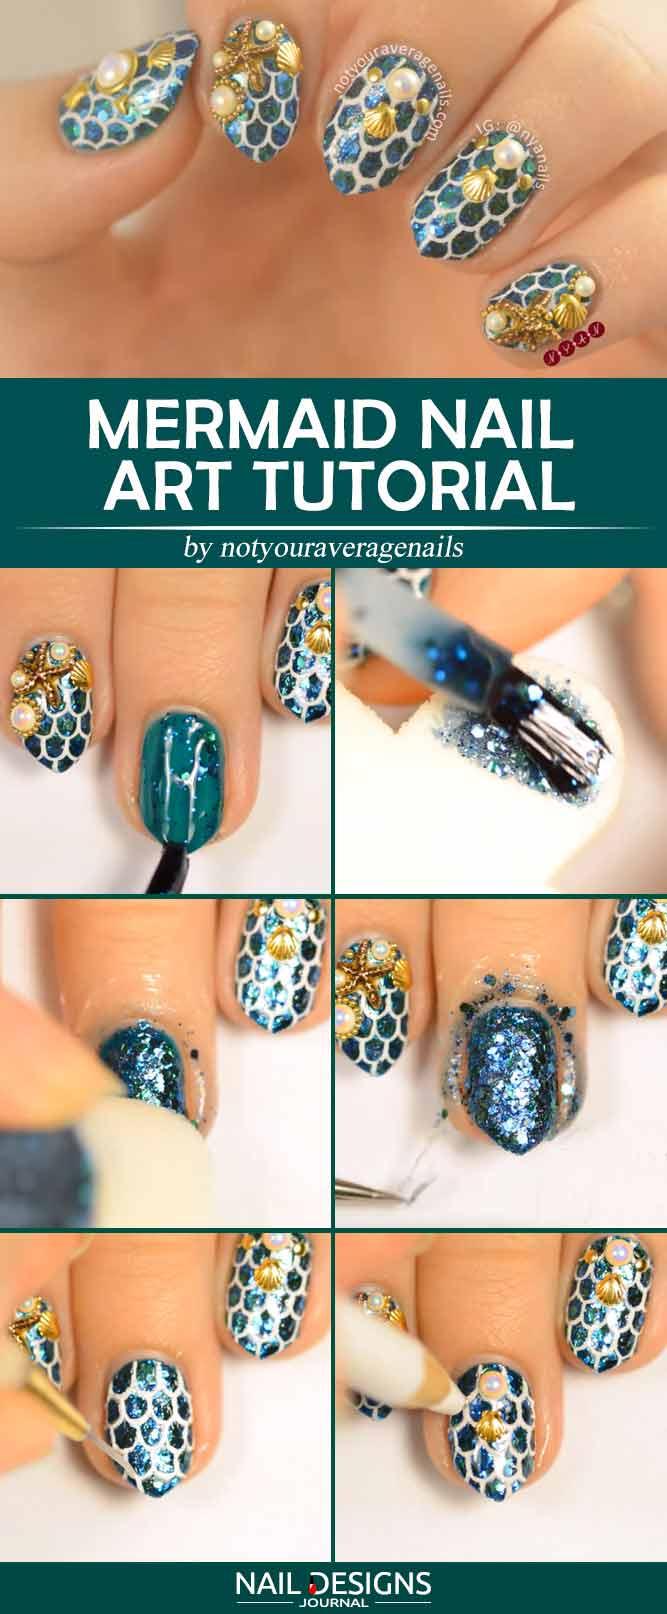 Mermaid Nail Art Tutorial